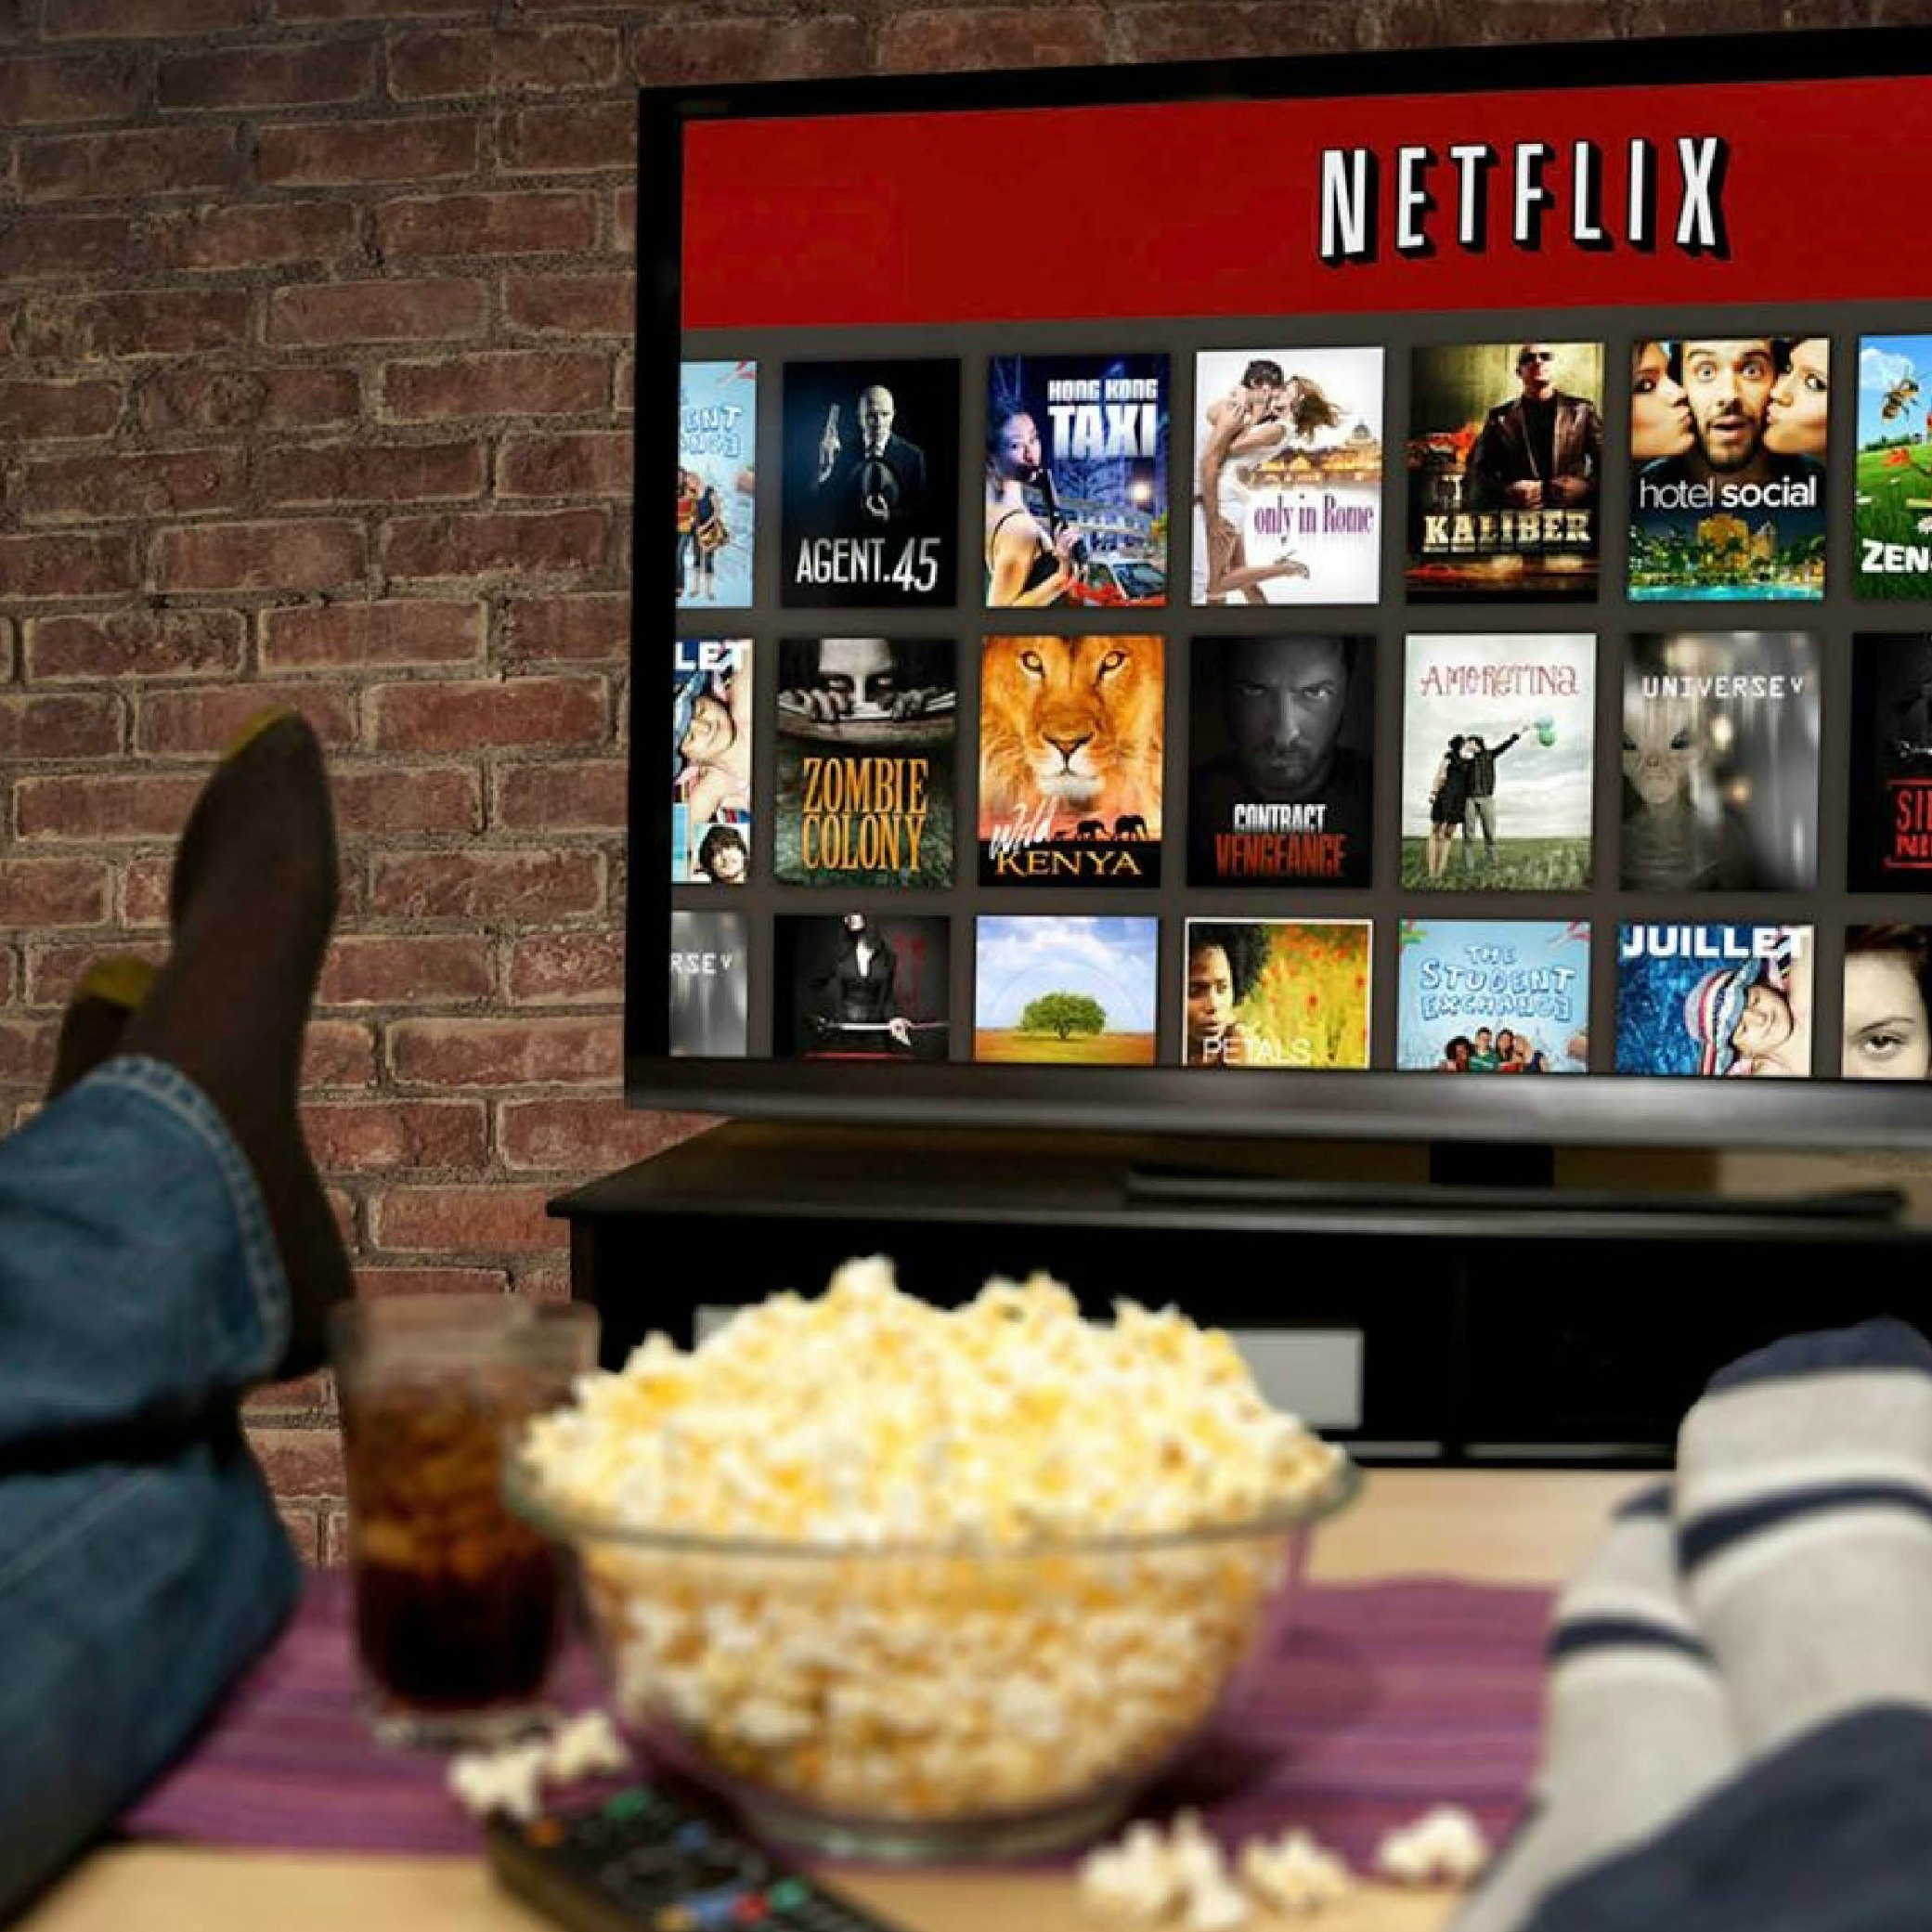 Netflix-square.jpg